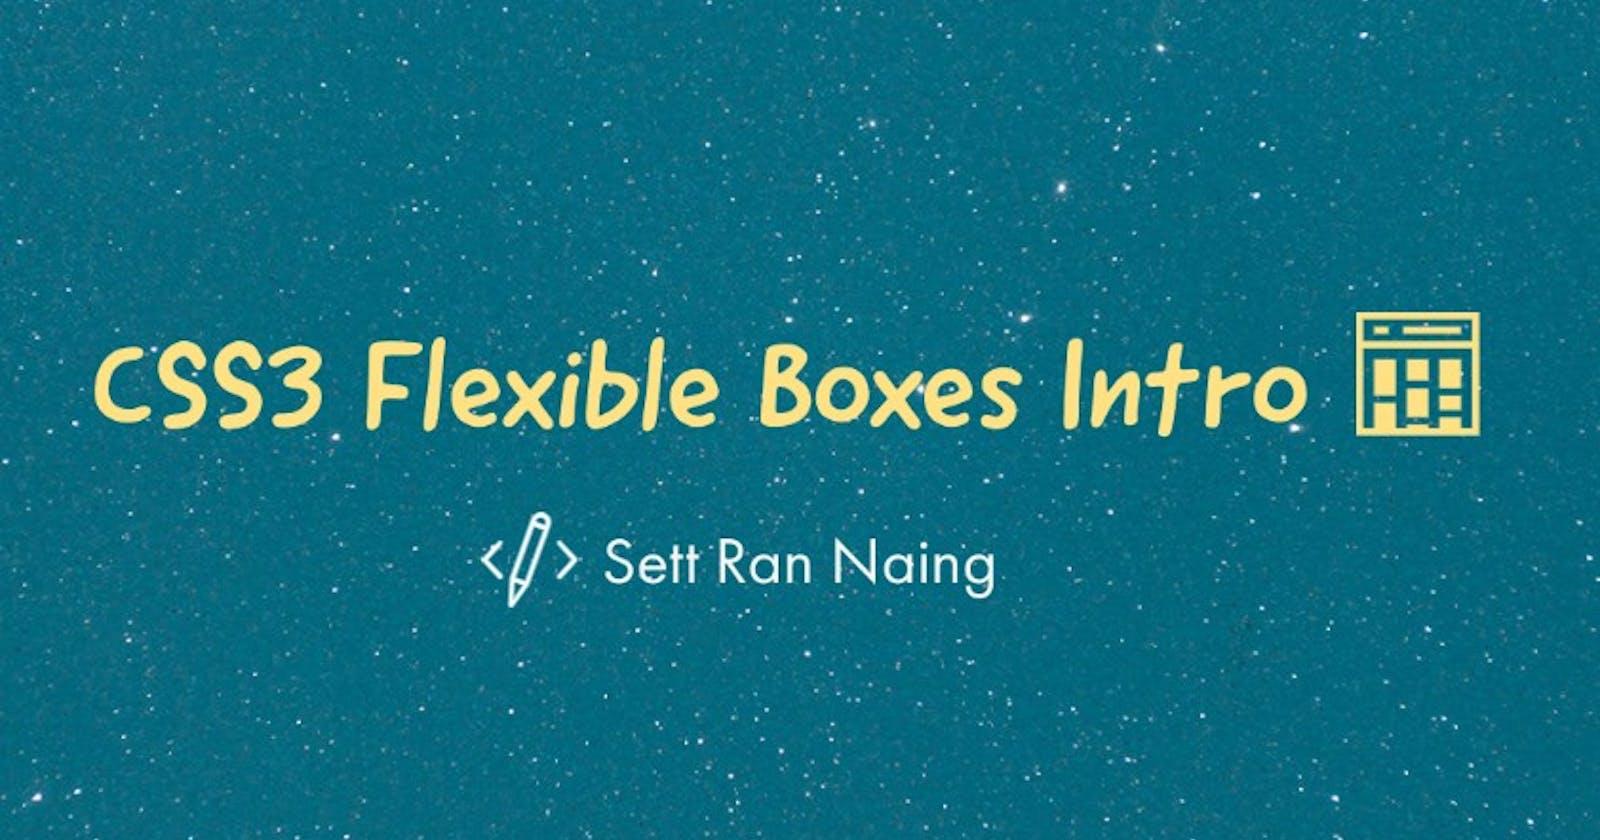 CSS3 Flexible Boxes Intro